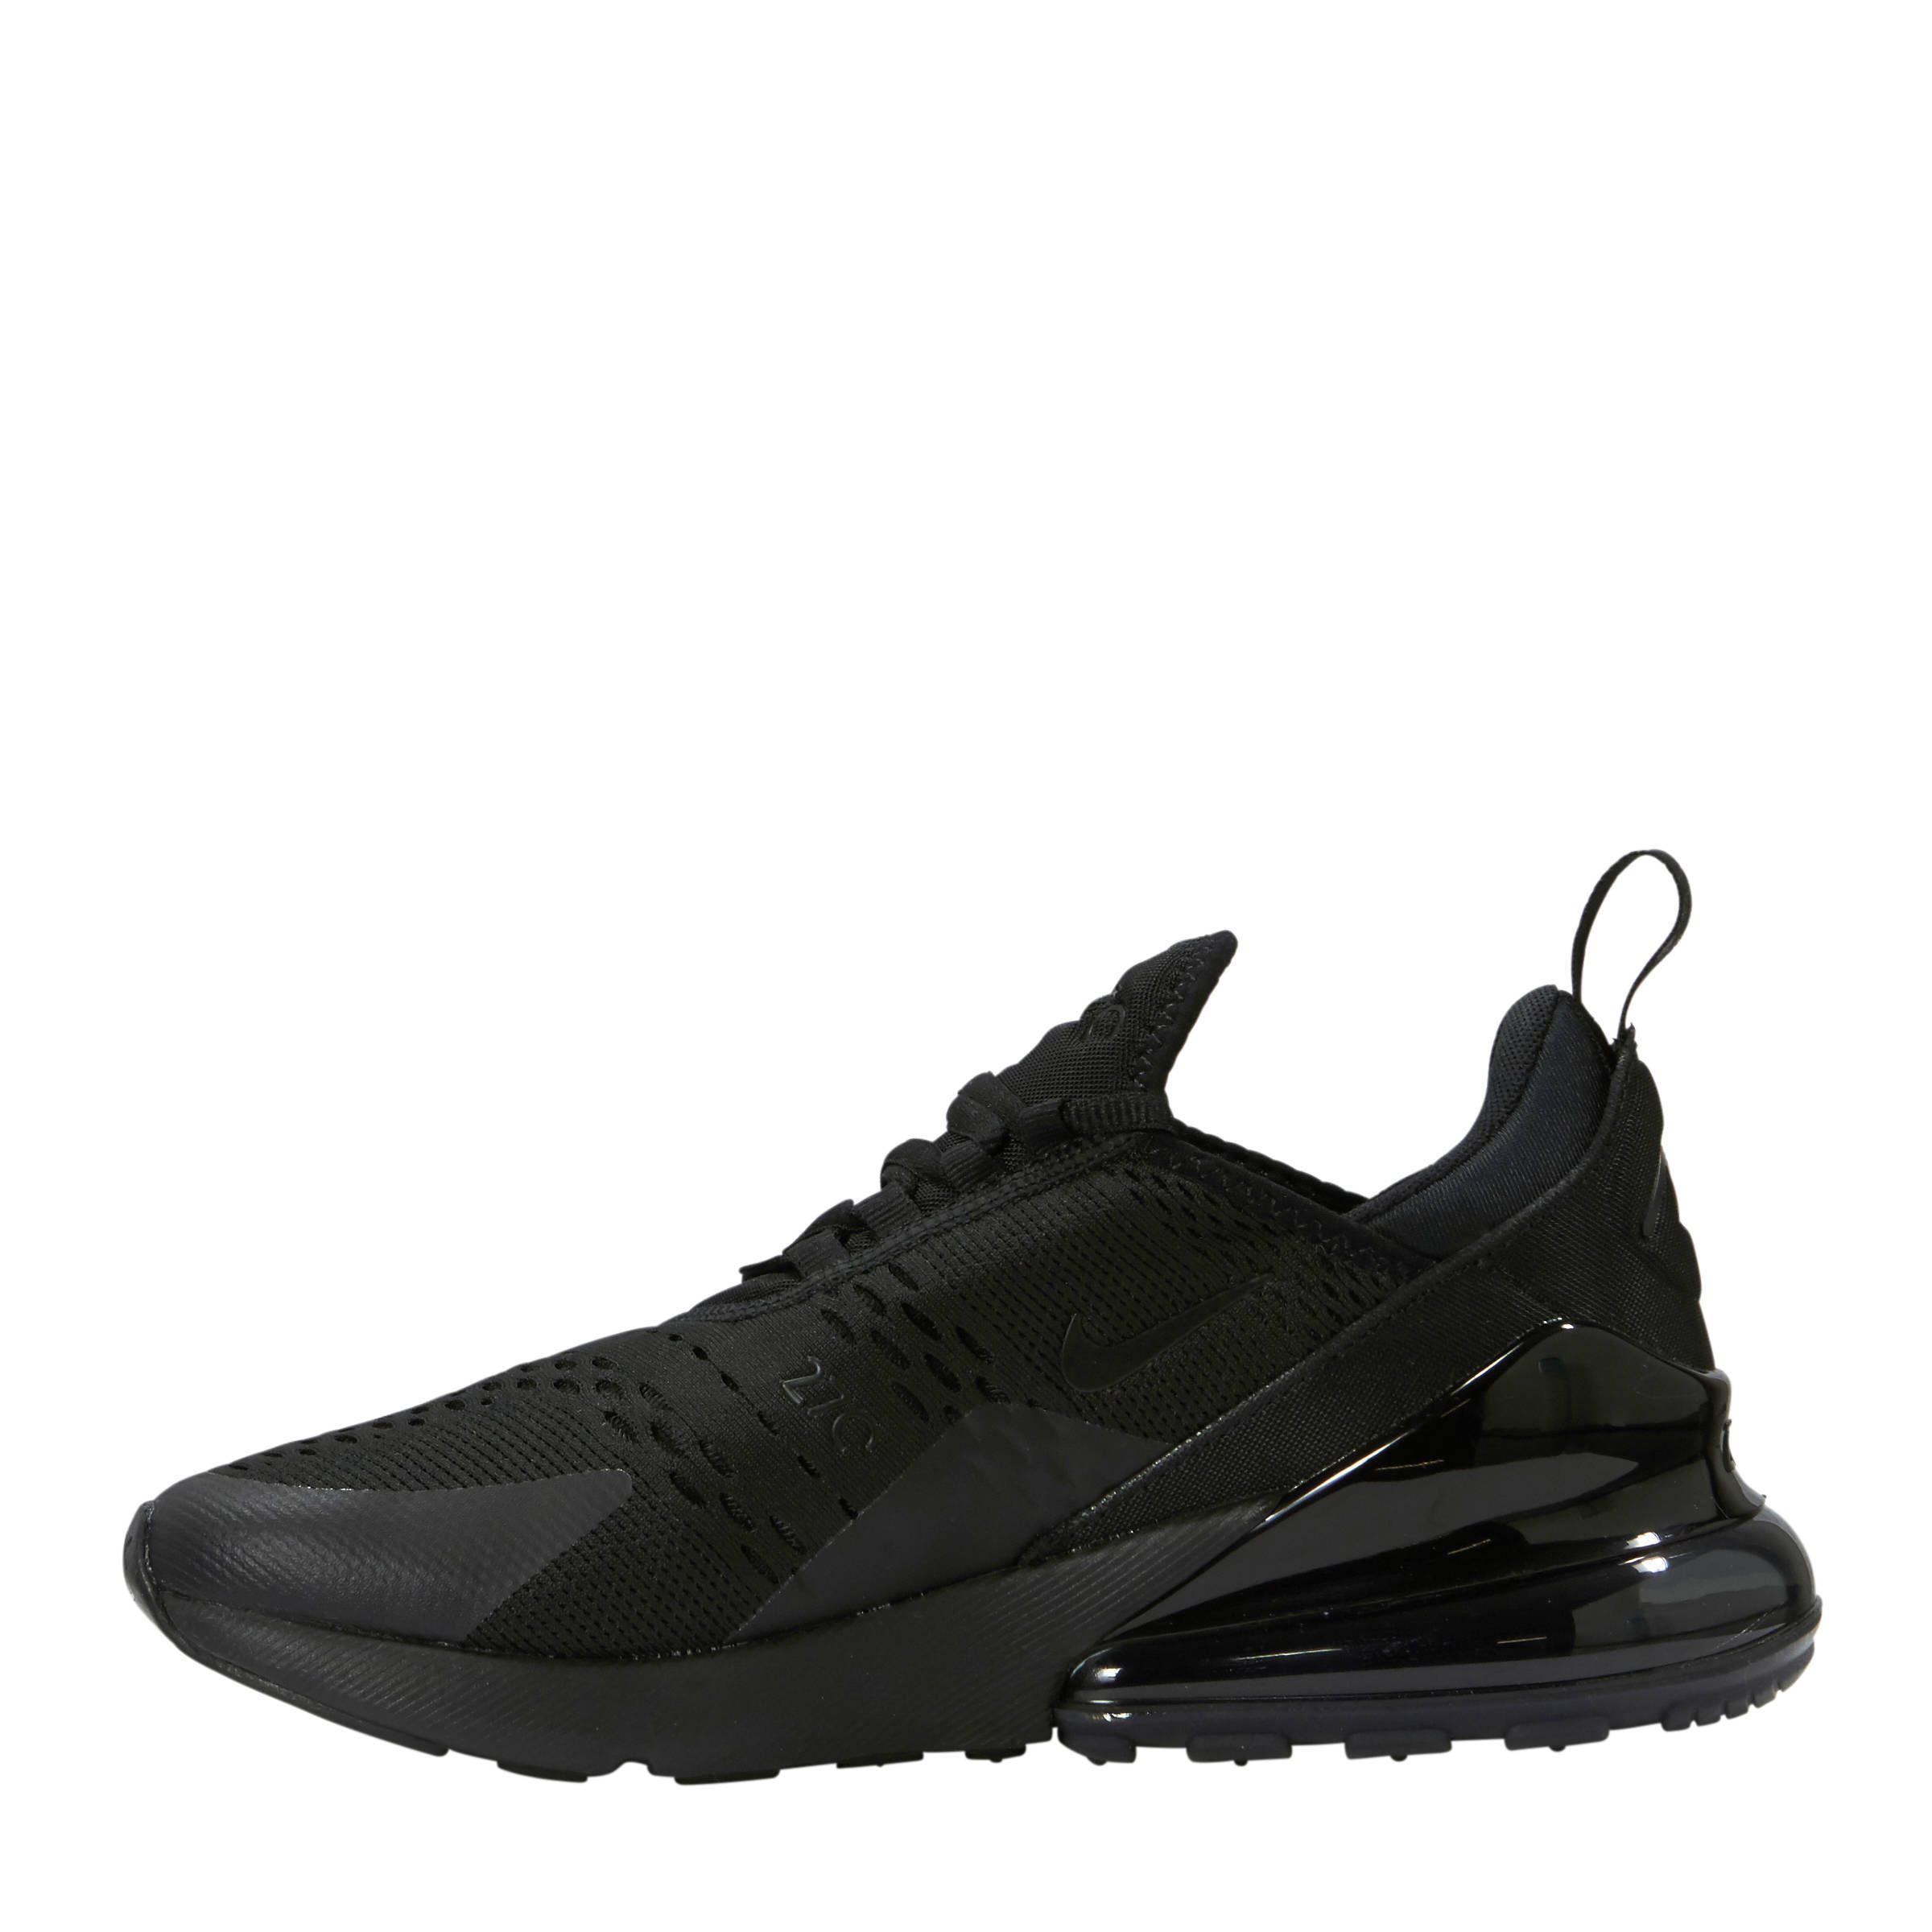 5b0d3a96e6f nike-air-max-270-sneakers-heren-zwart-0666003558339.jpg